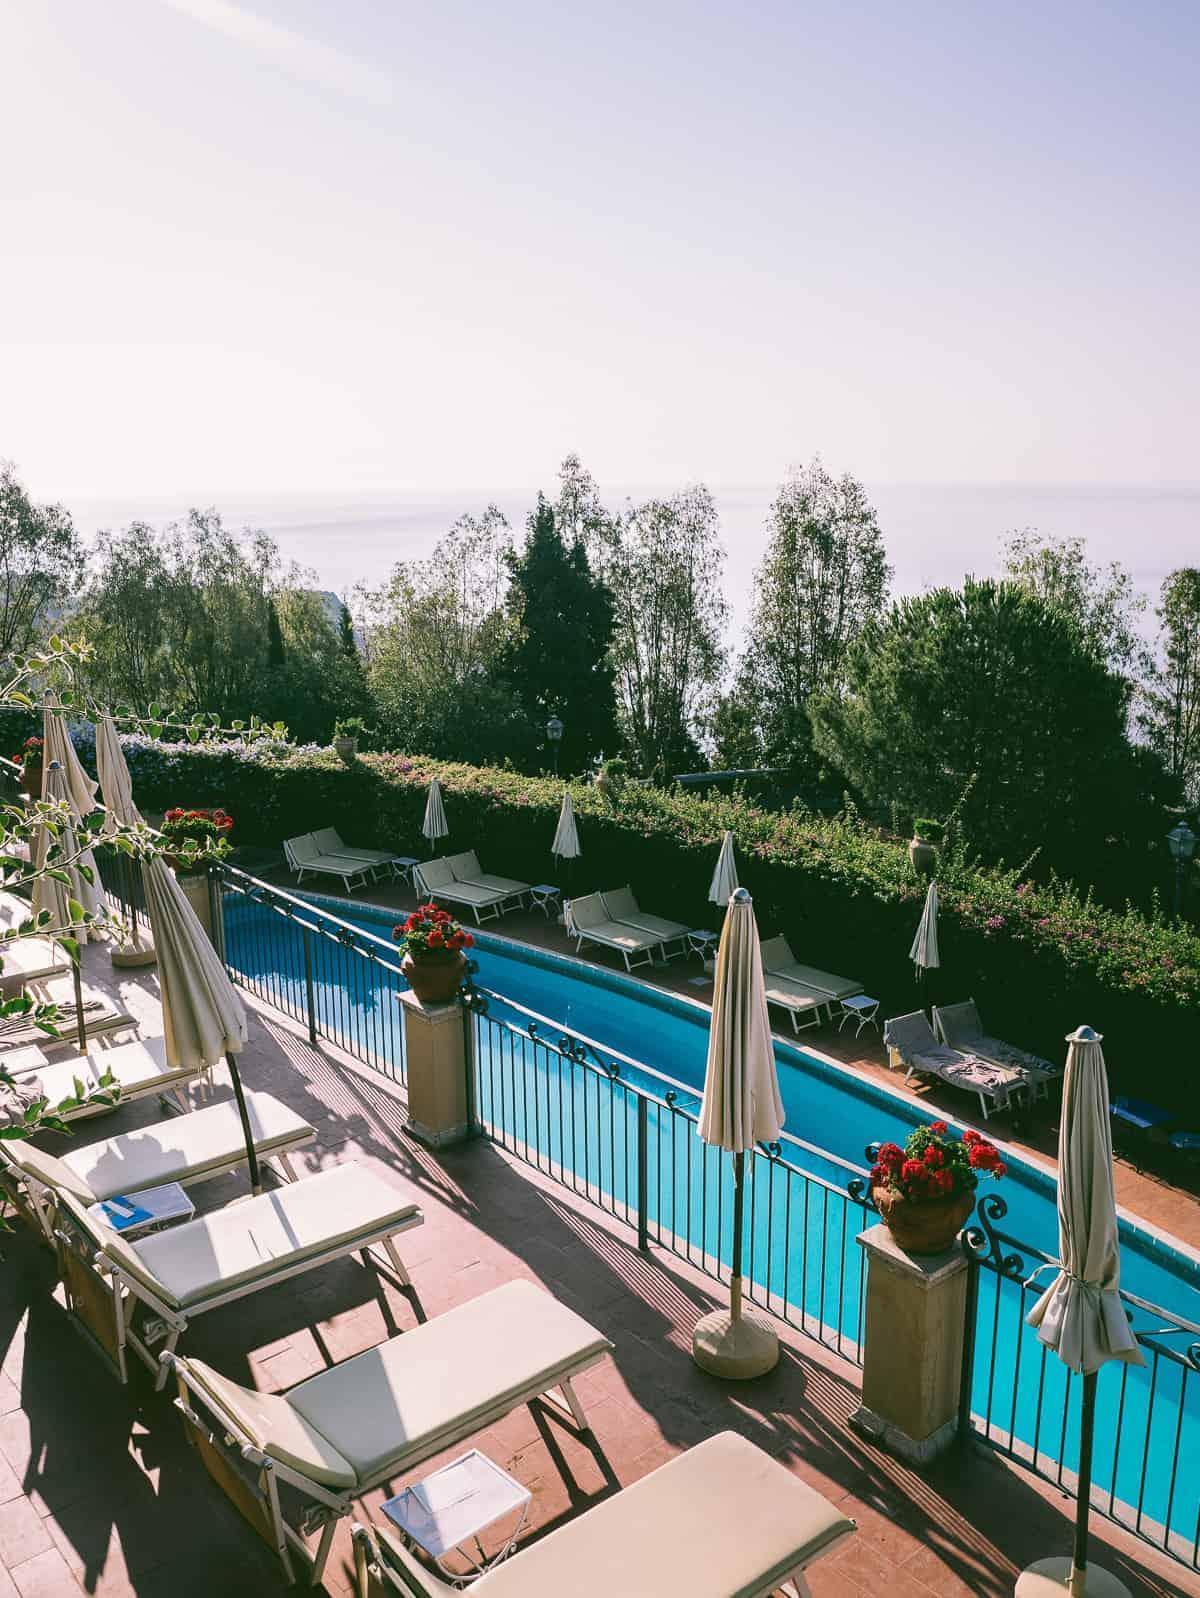 the pool area at the San Domenico Palace Hotel Taormina Sicily